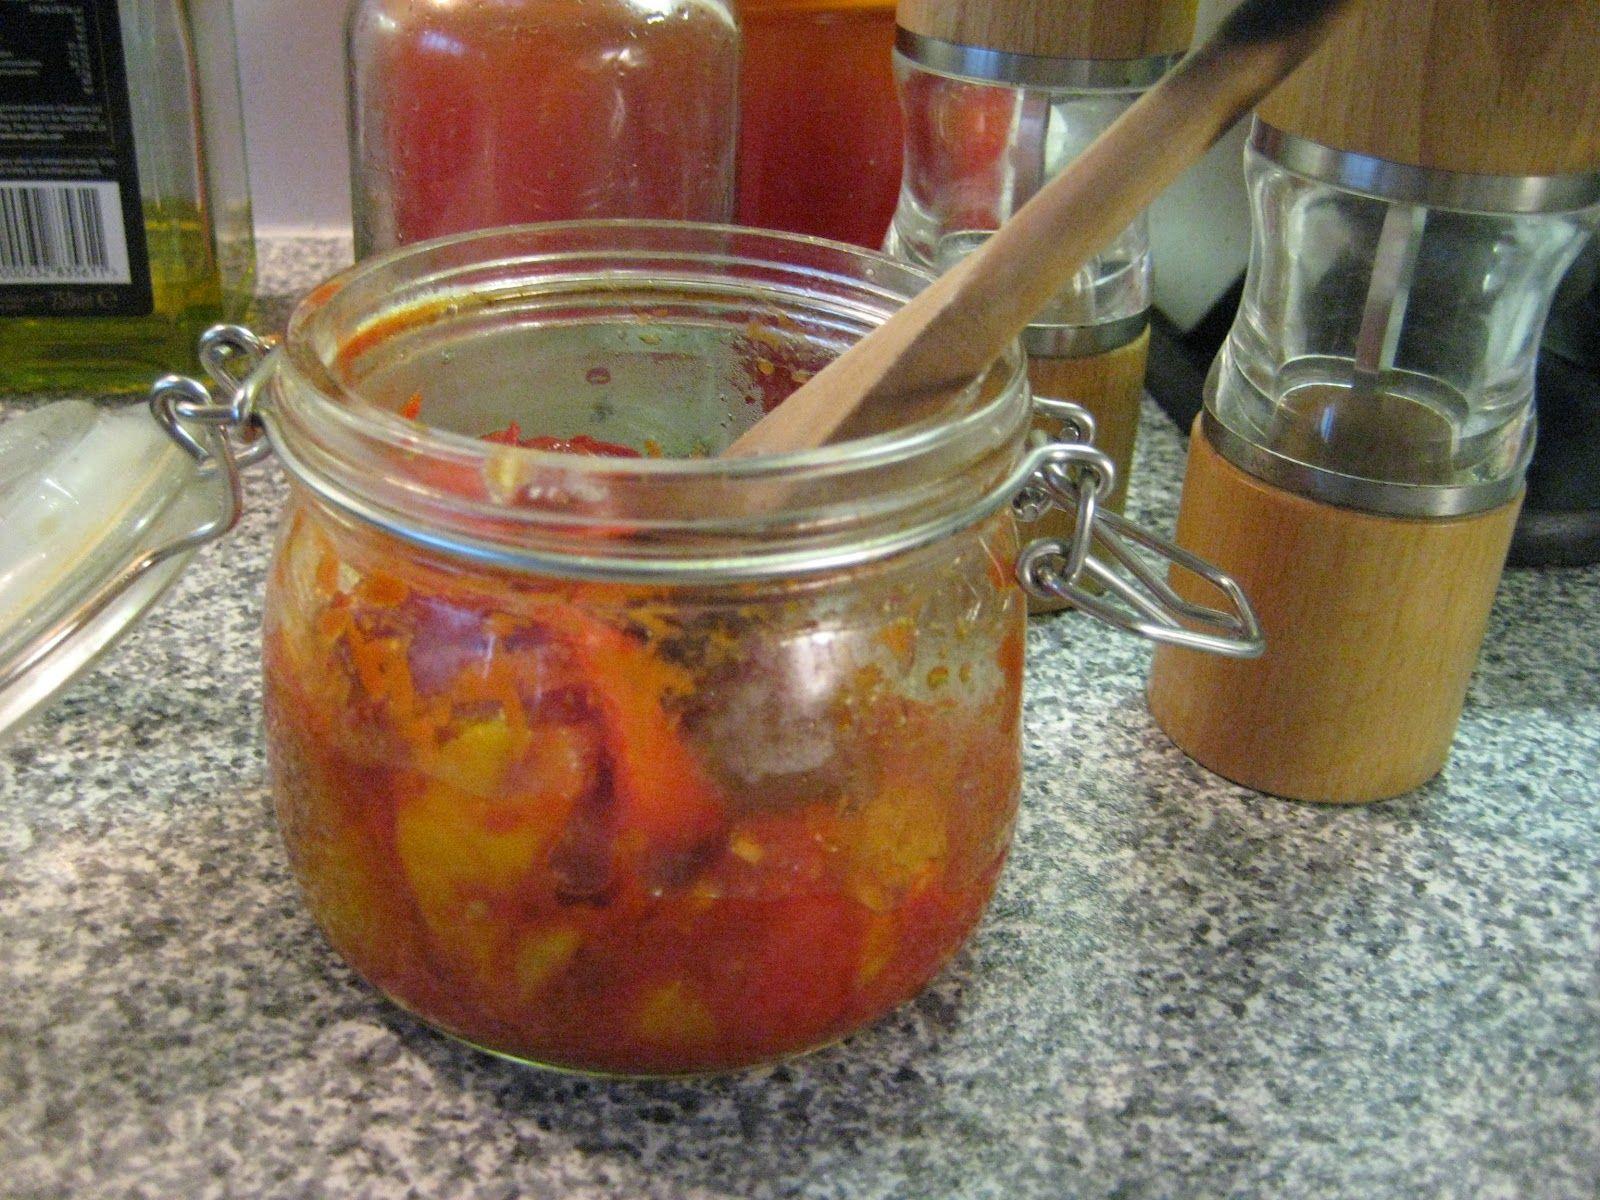 Tomato & Yellow Pepper Sauce